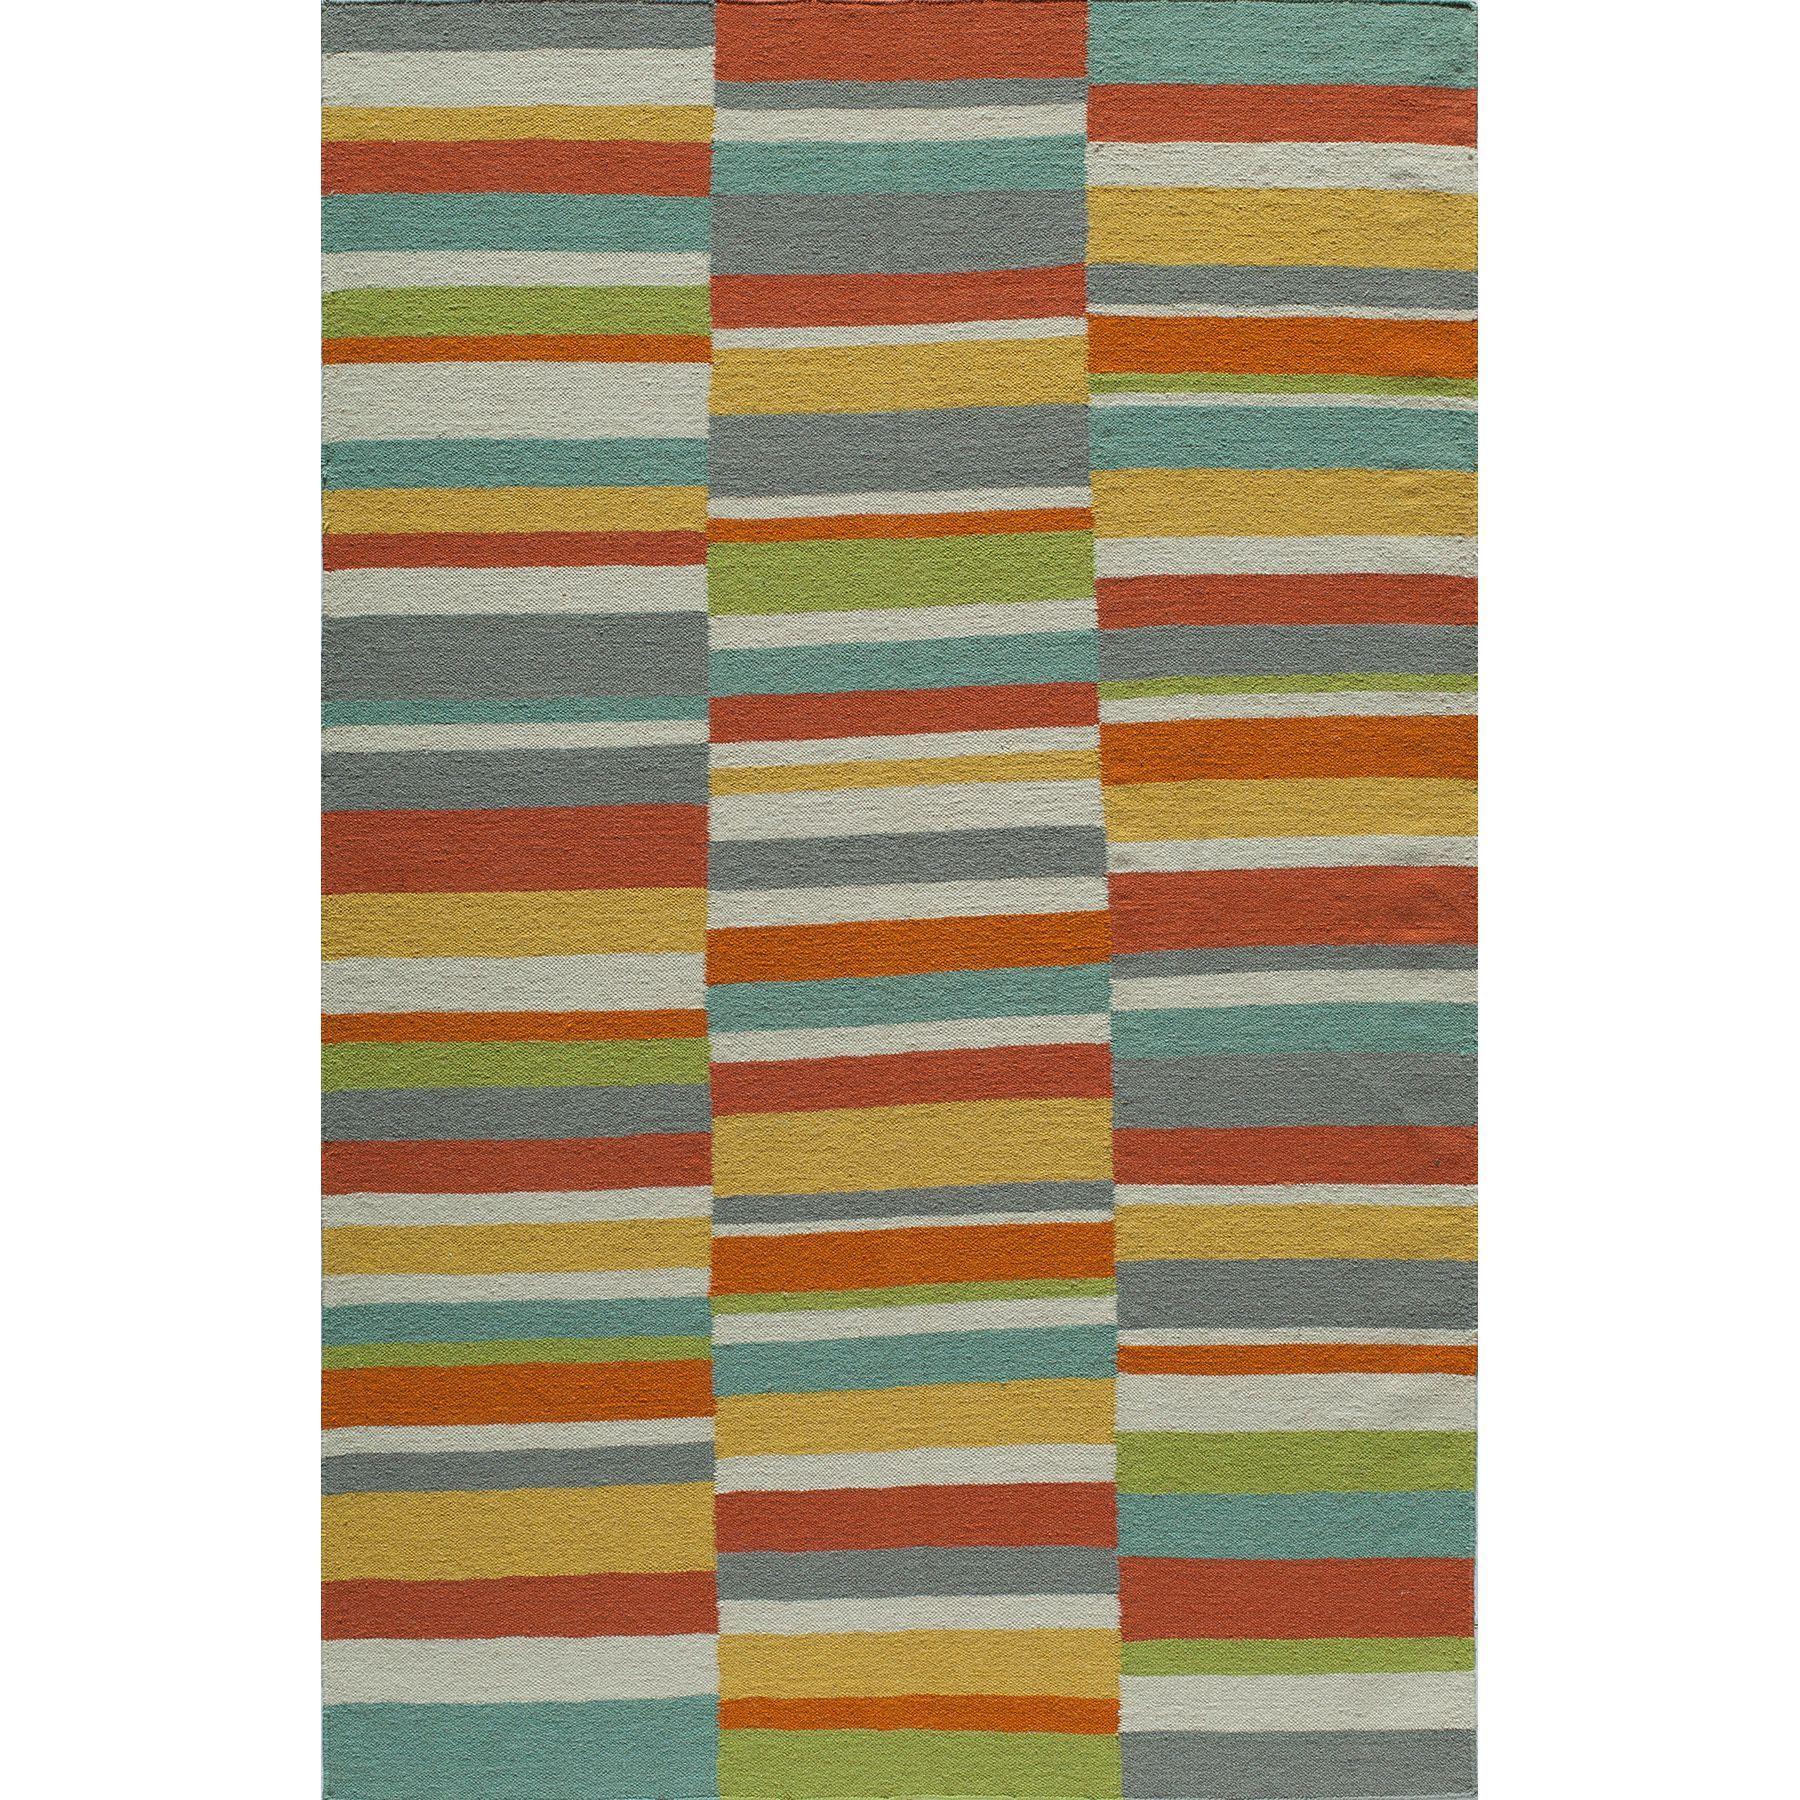 Momeni Mersa Asymmetric Stripe Reversible Flat Weave Dhurrie Area Rug